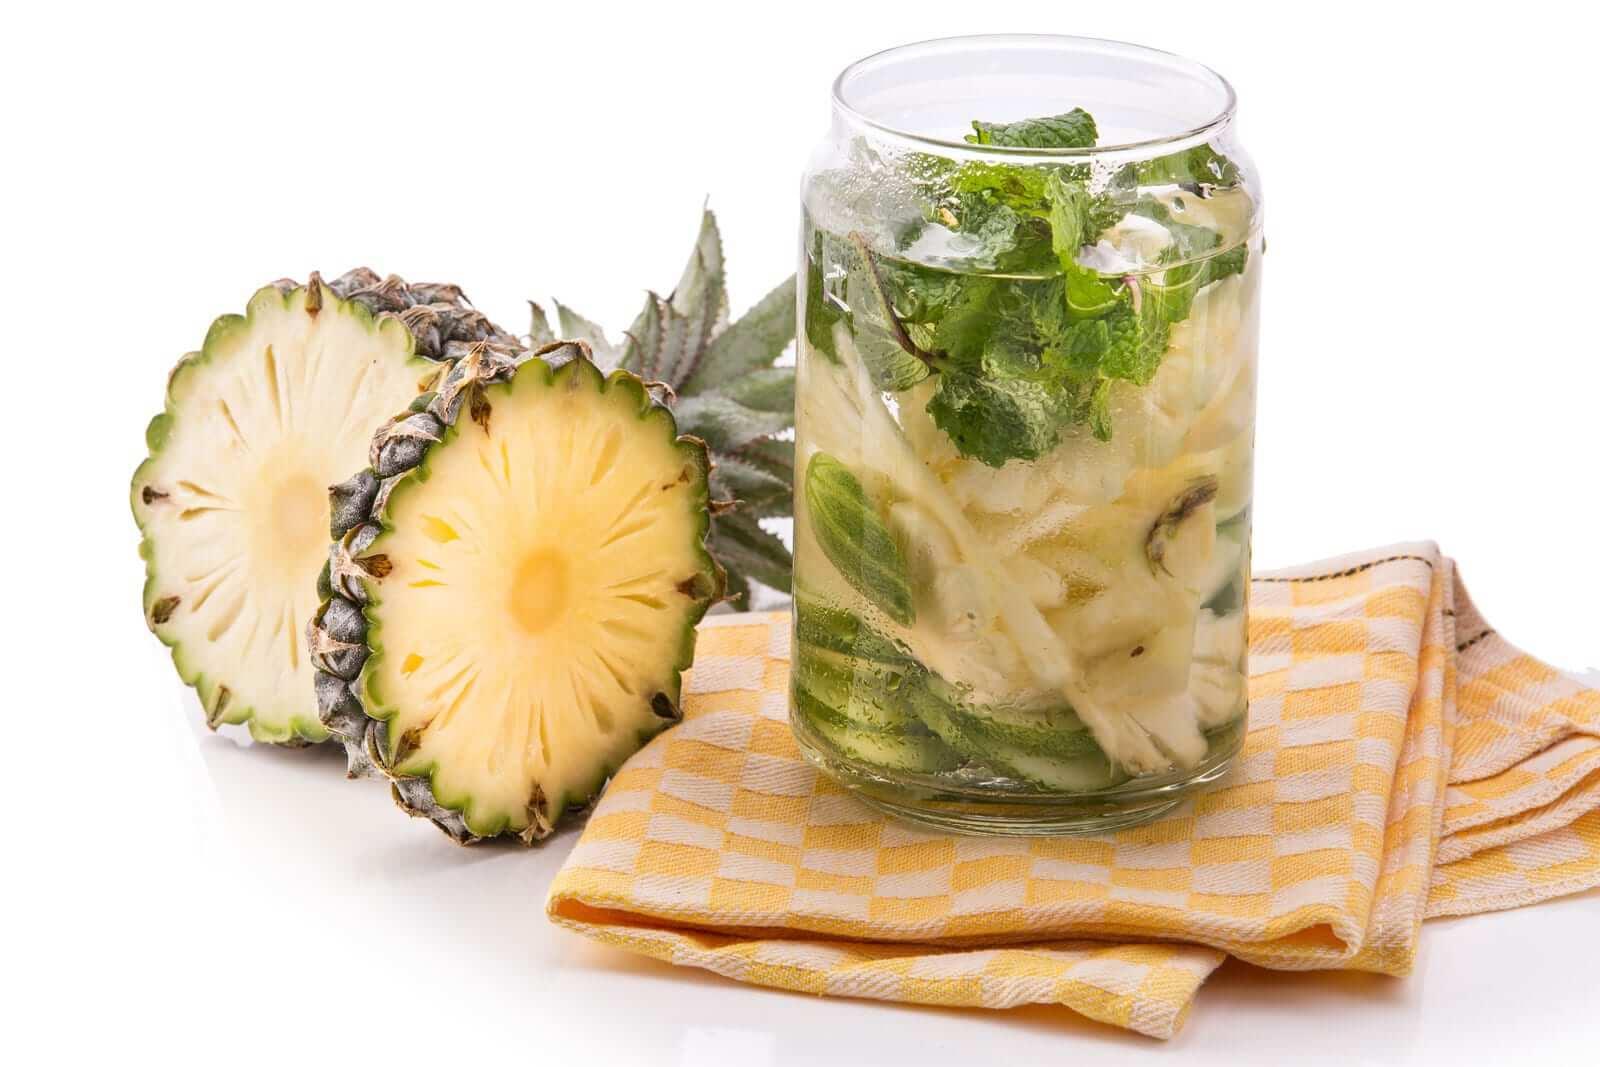 Ananas Basilikum detox wasser rezepte